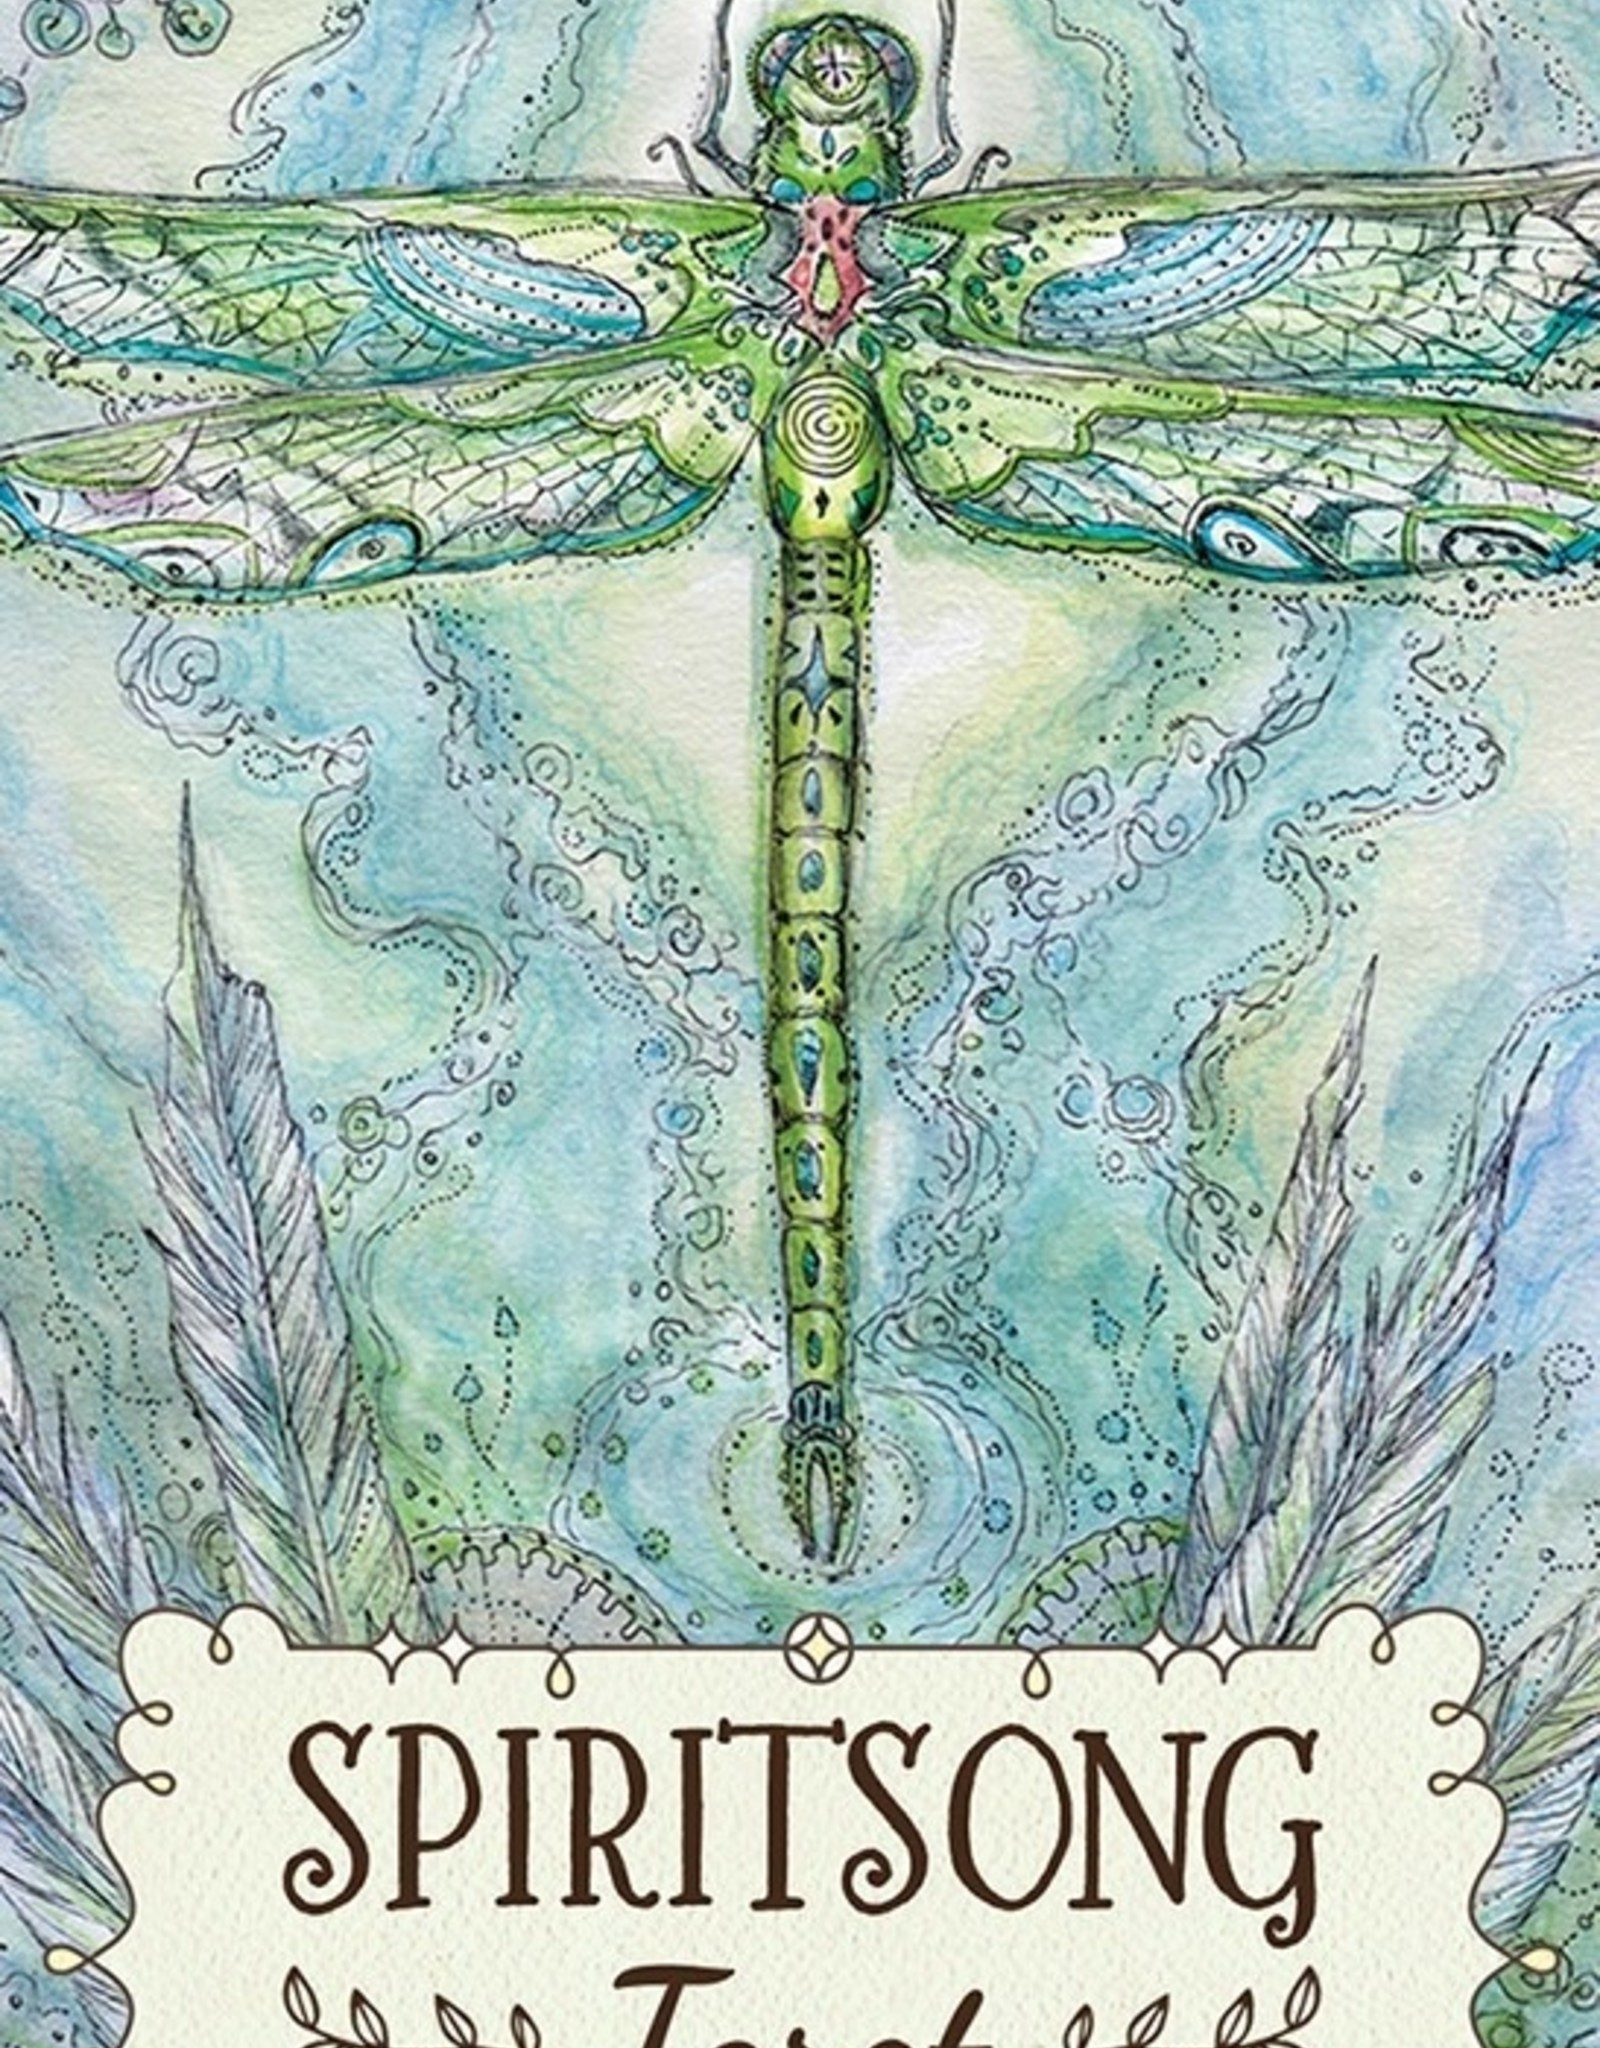 U.S. Games Systems, Inc. Spiritsong Tarot